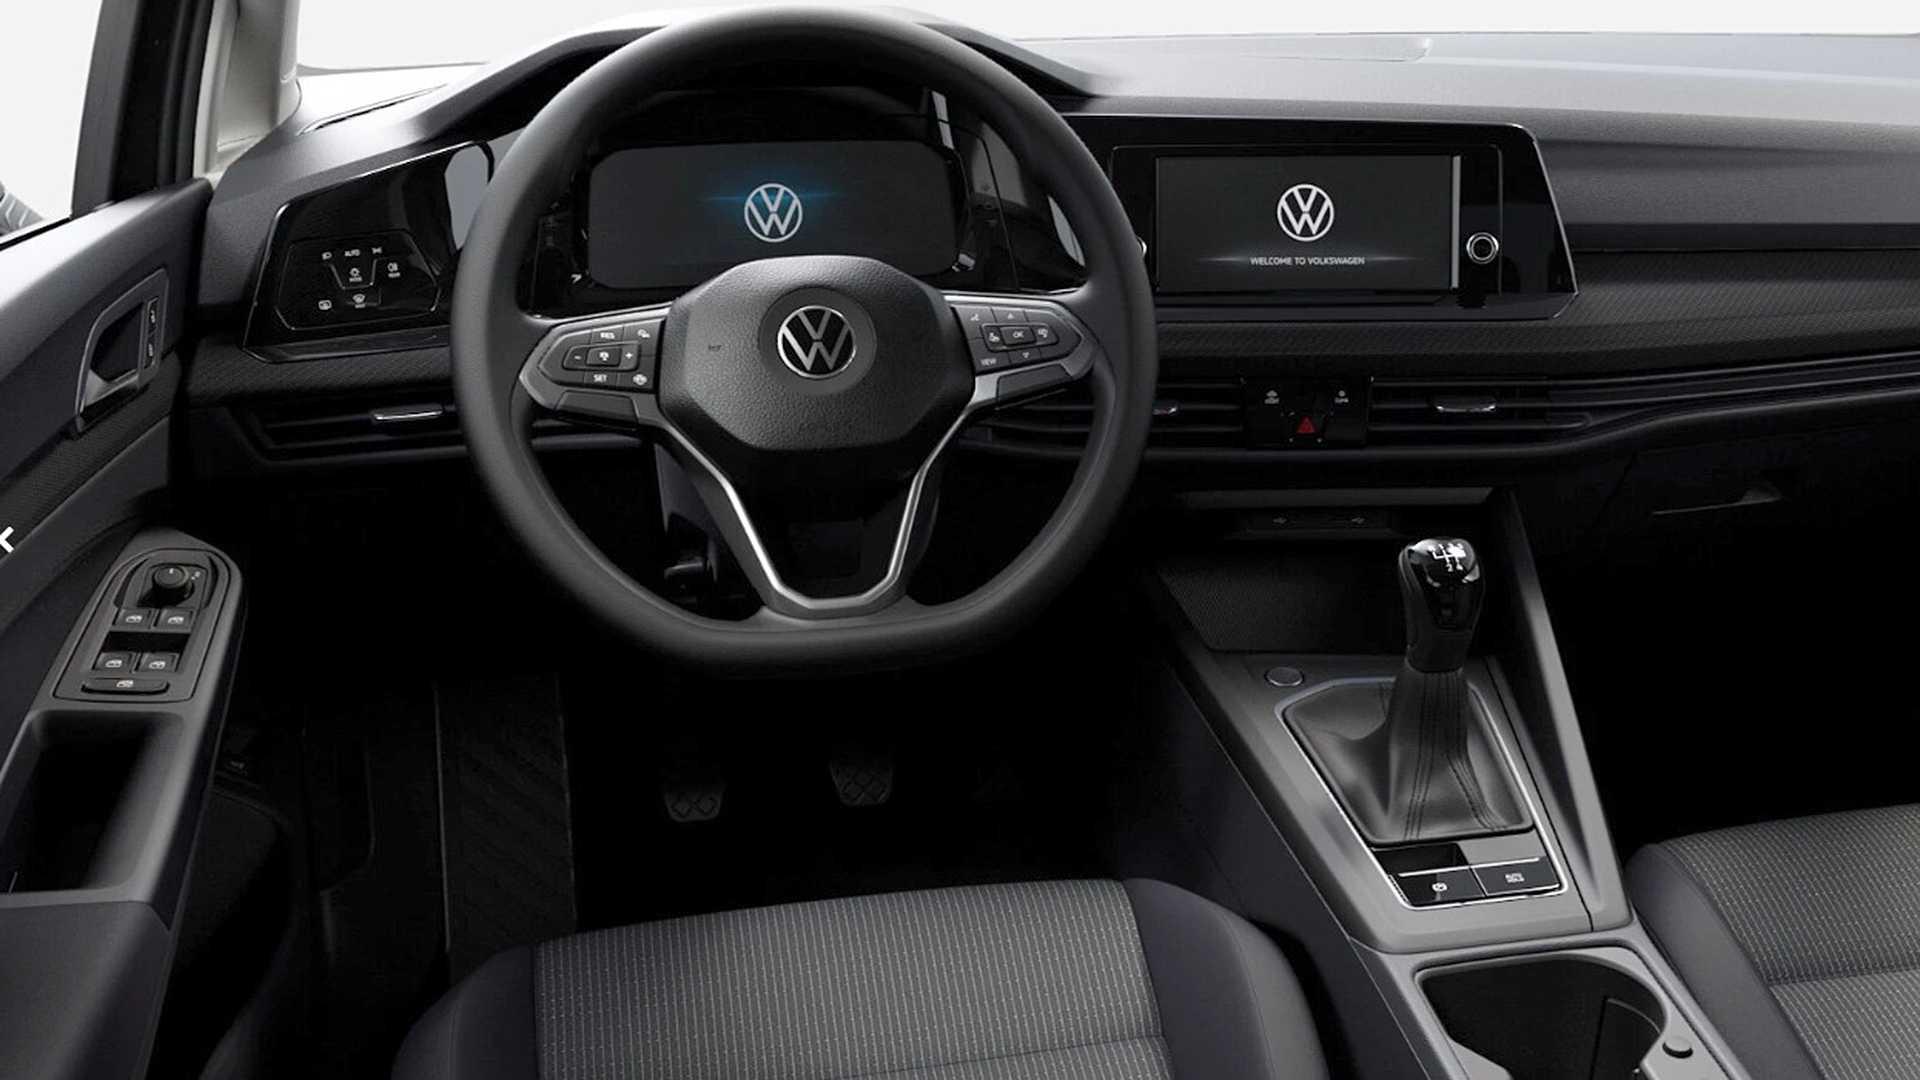 Volkswagen-Golf-2020-Base-Model-8